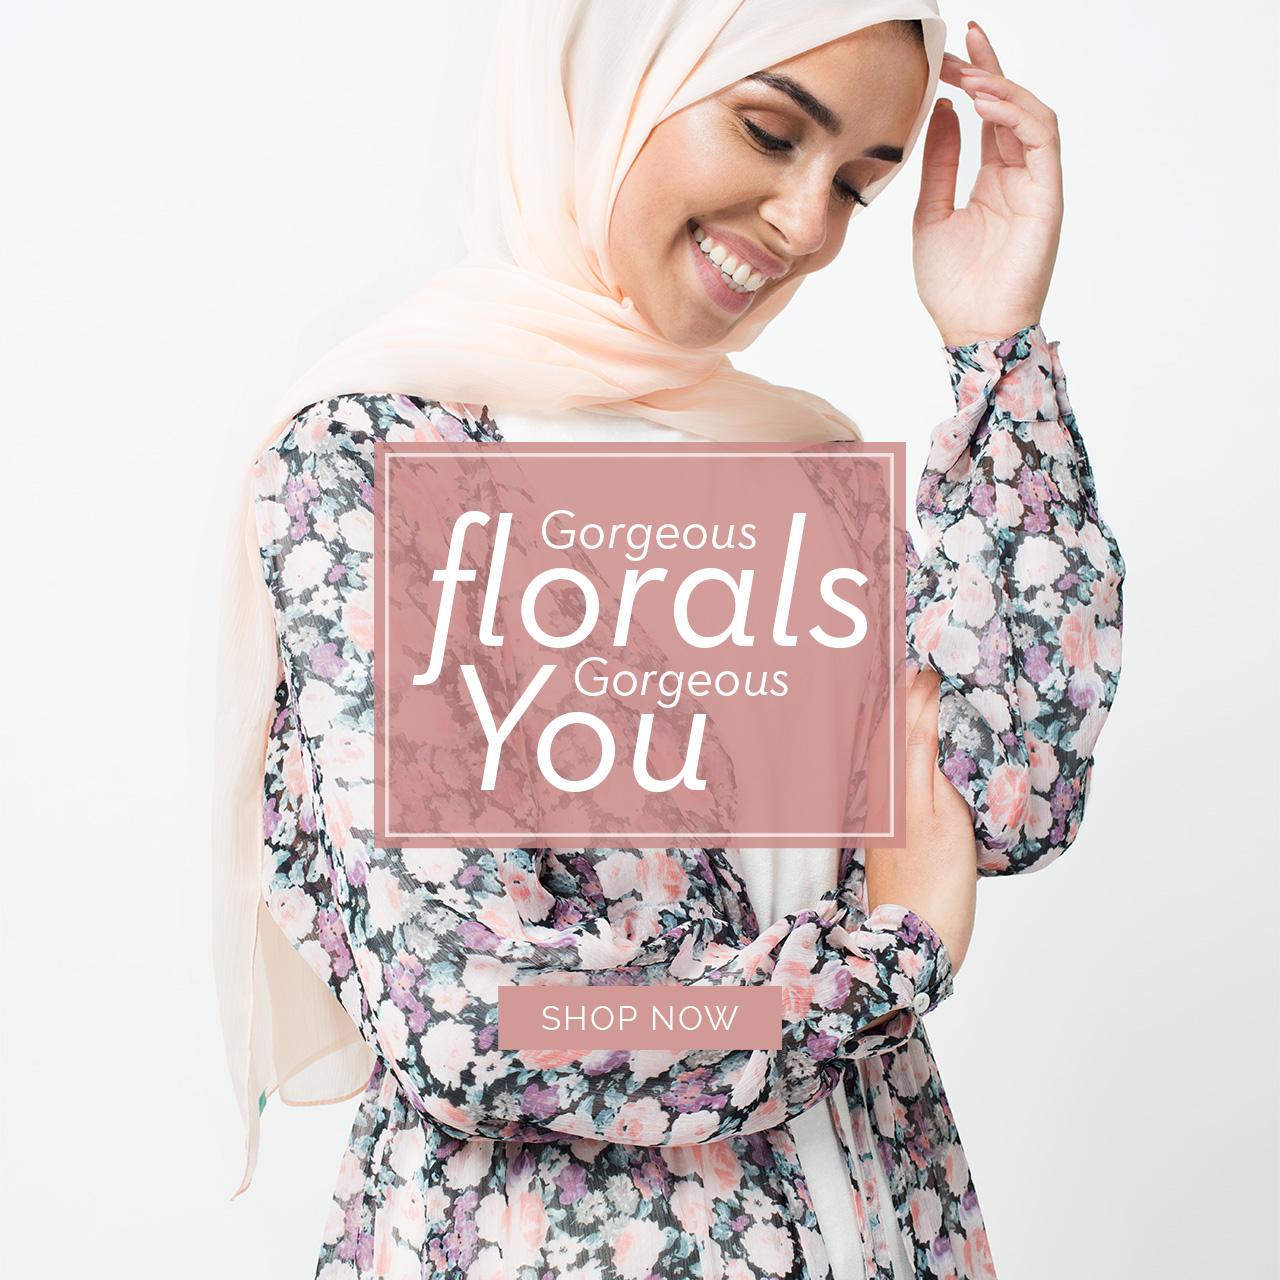 Modestwear floral outerwear